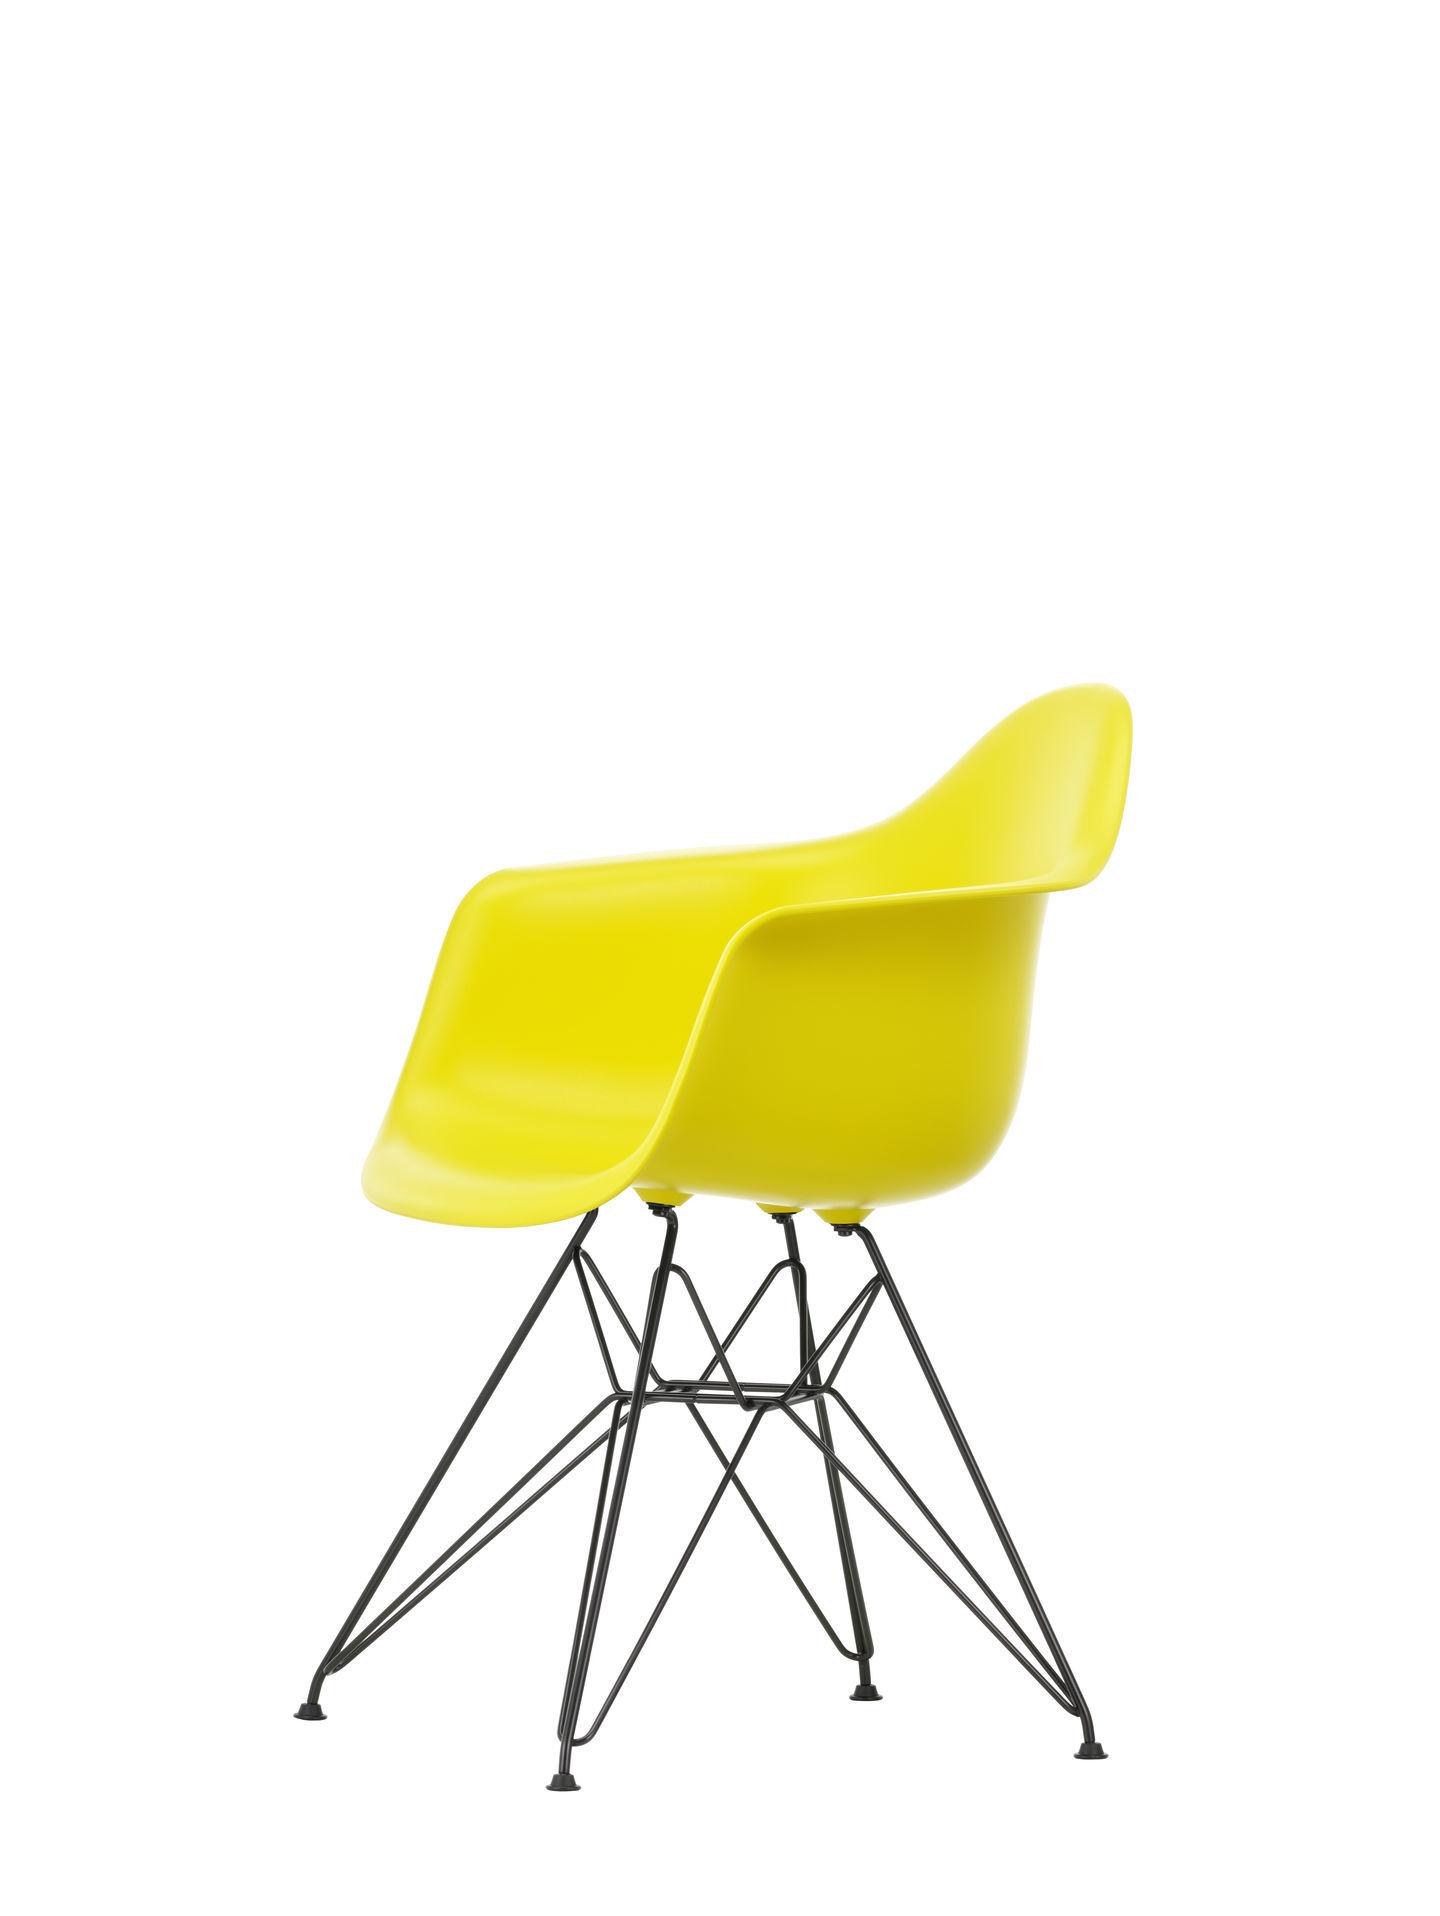 Eames Plastic Arm Chair DAR Stuhl Vitra Schwarz - Zartrosa